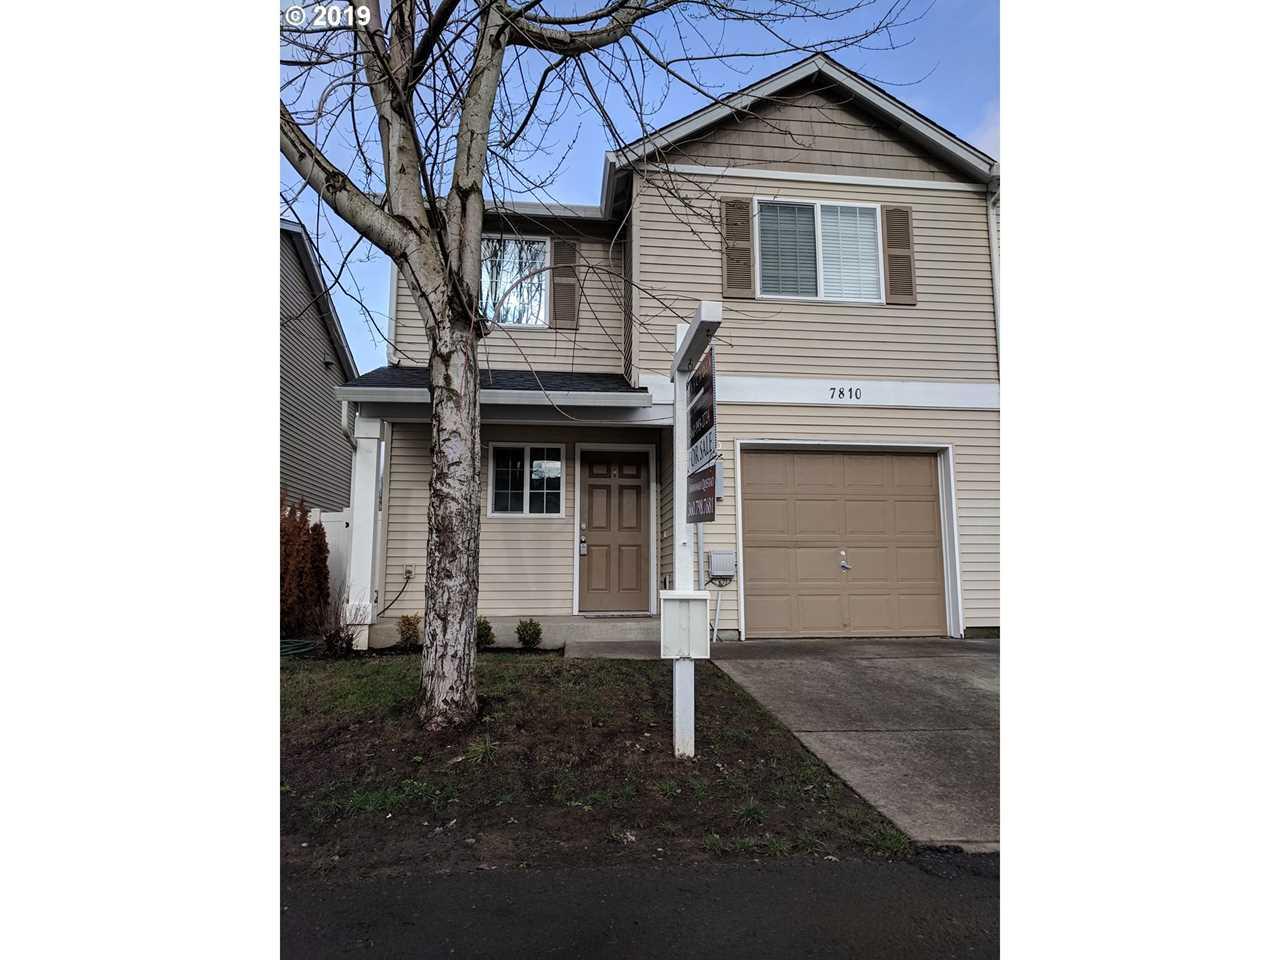 Vancouver Wa Home For Sale 7810 Ne 62nd Way Vancouver Wa Mls 18203150 Neighborhood